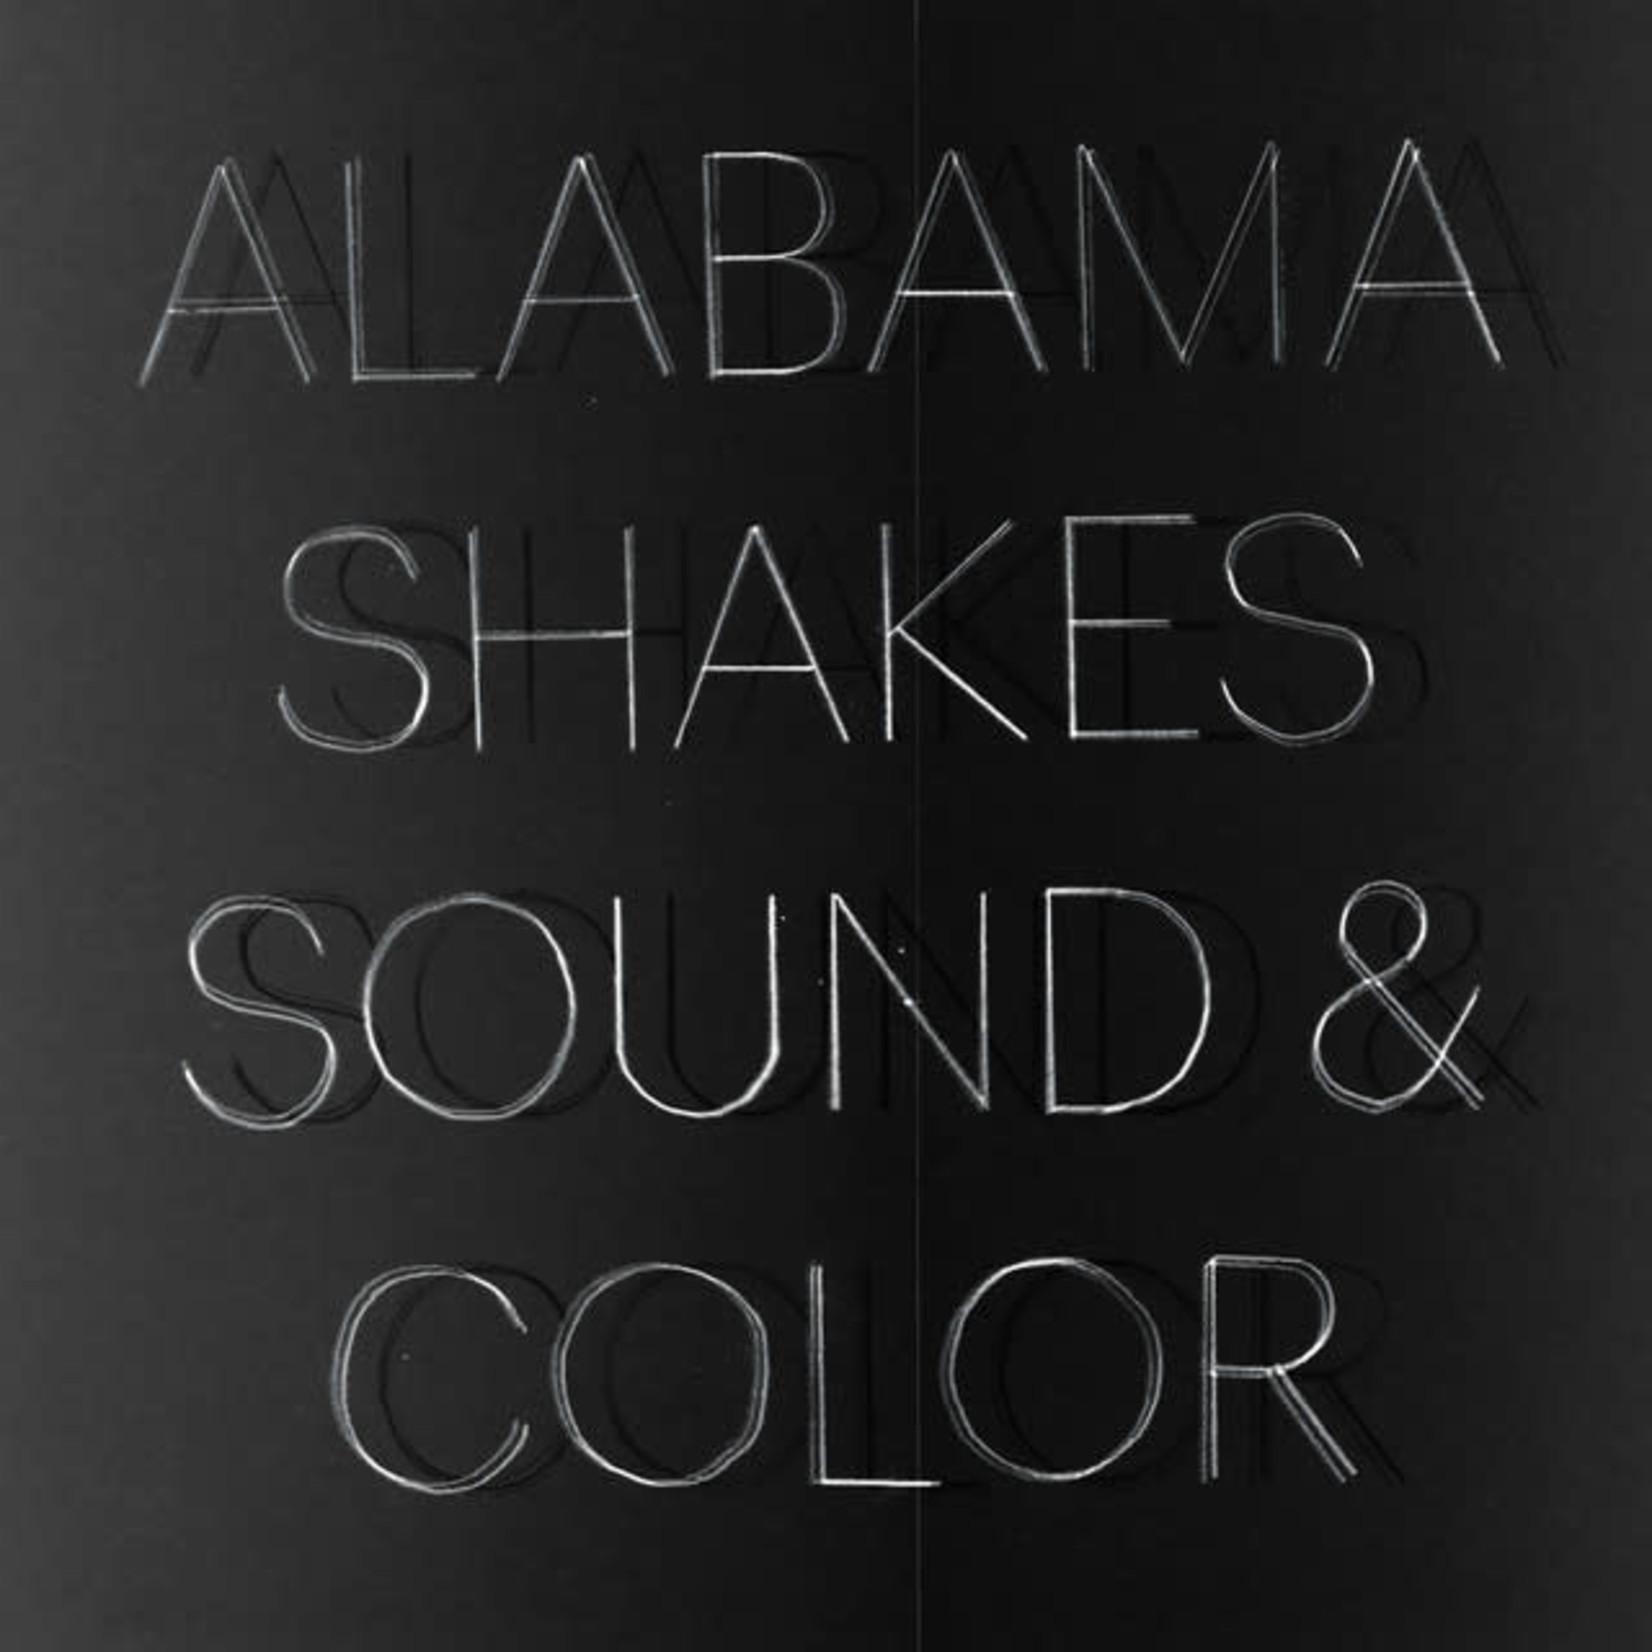 Vinyl Alabama Shakes - Sound & Color